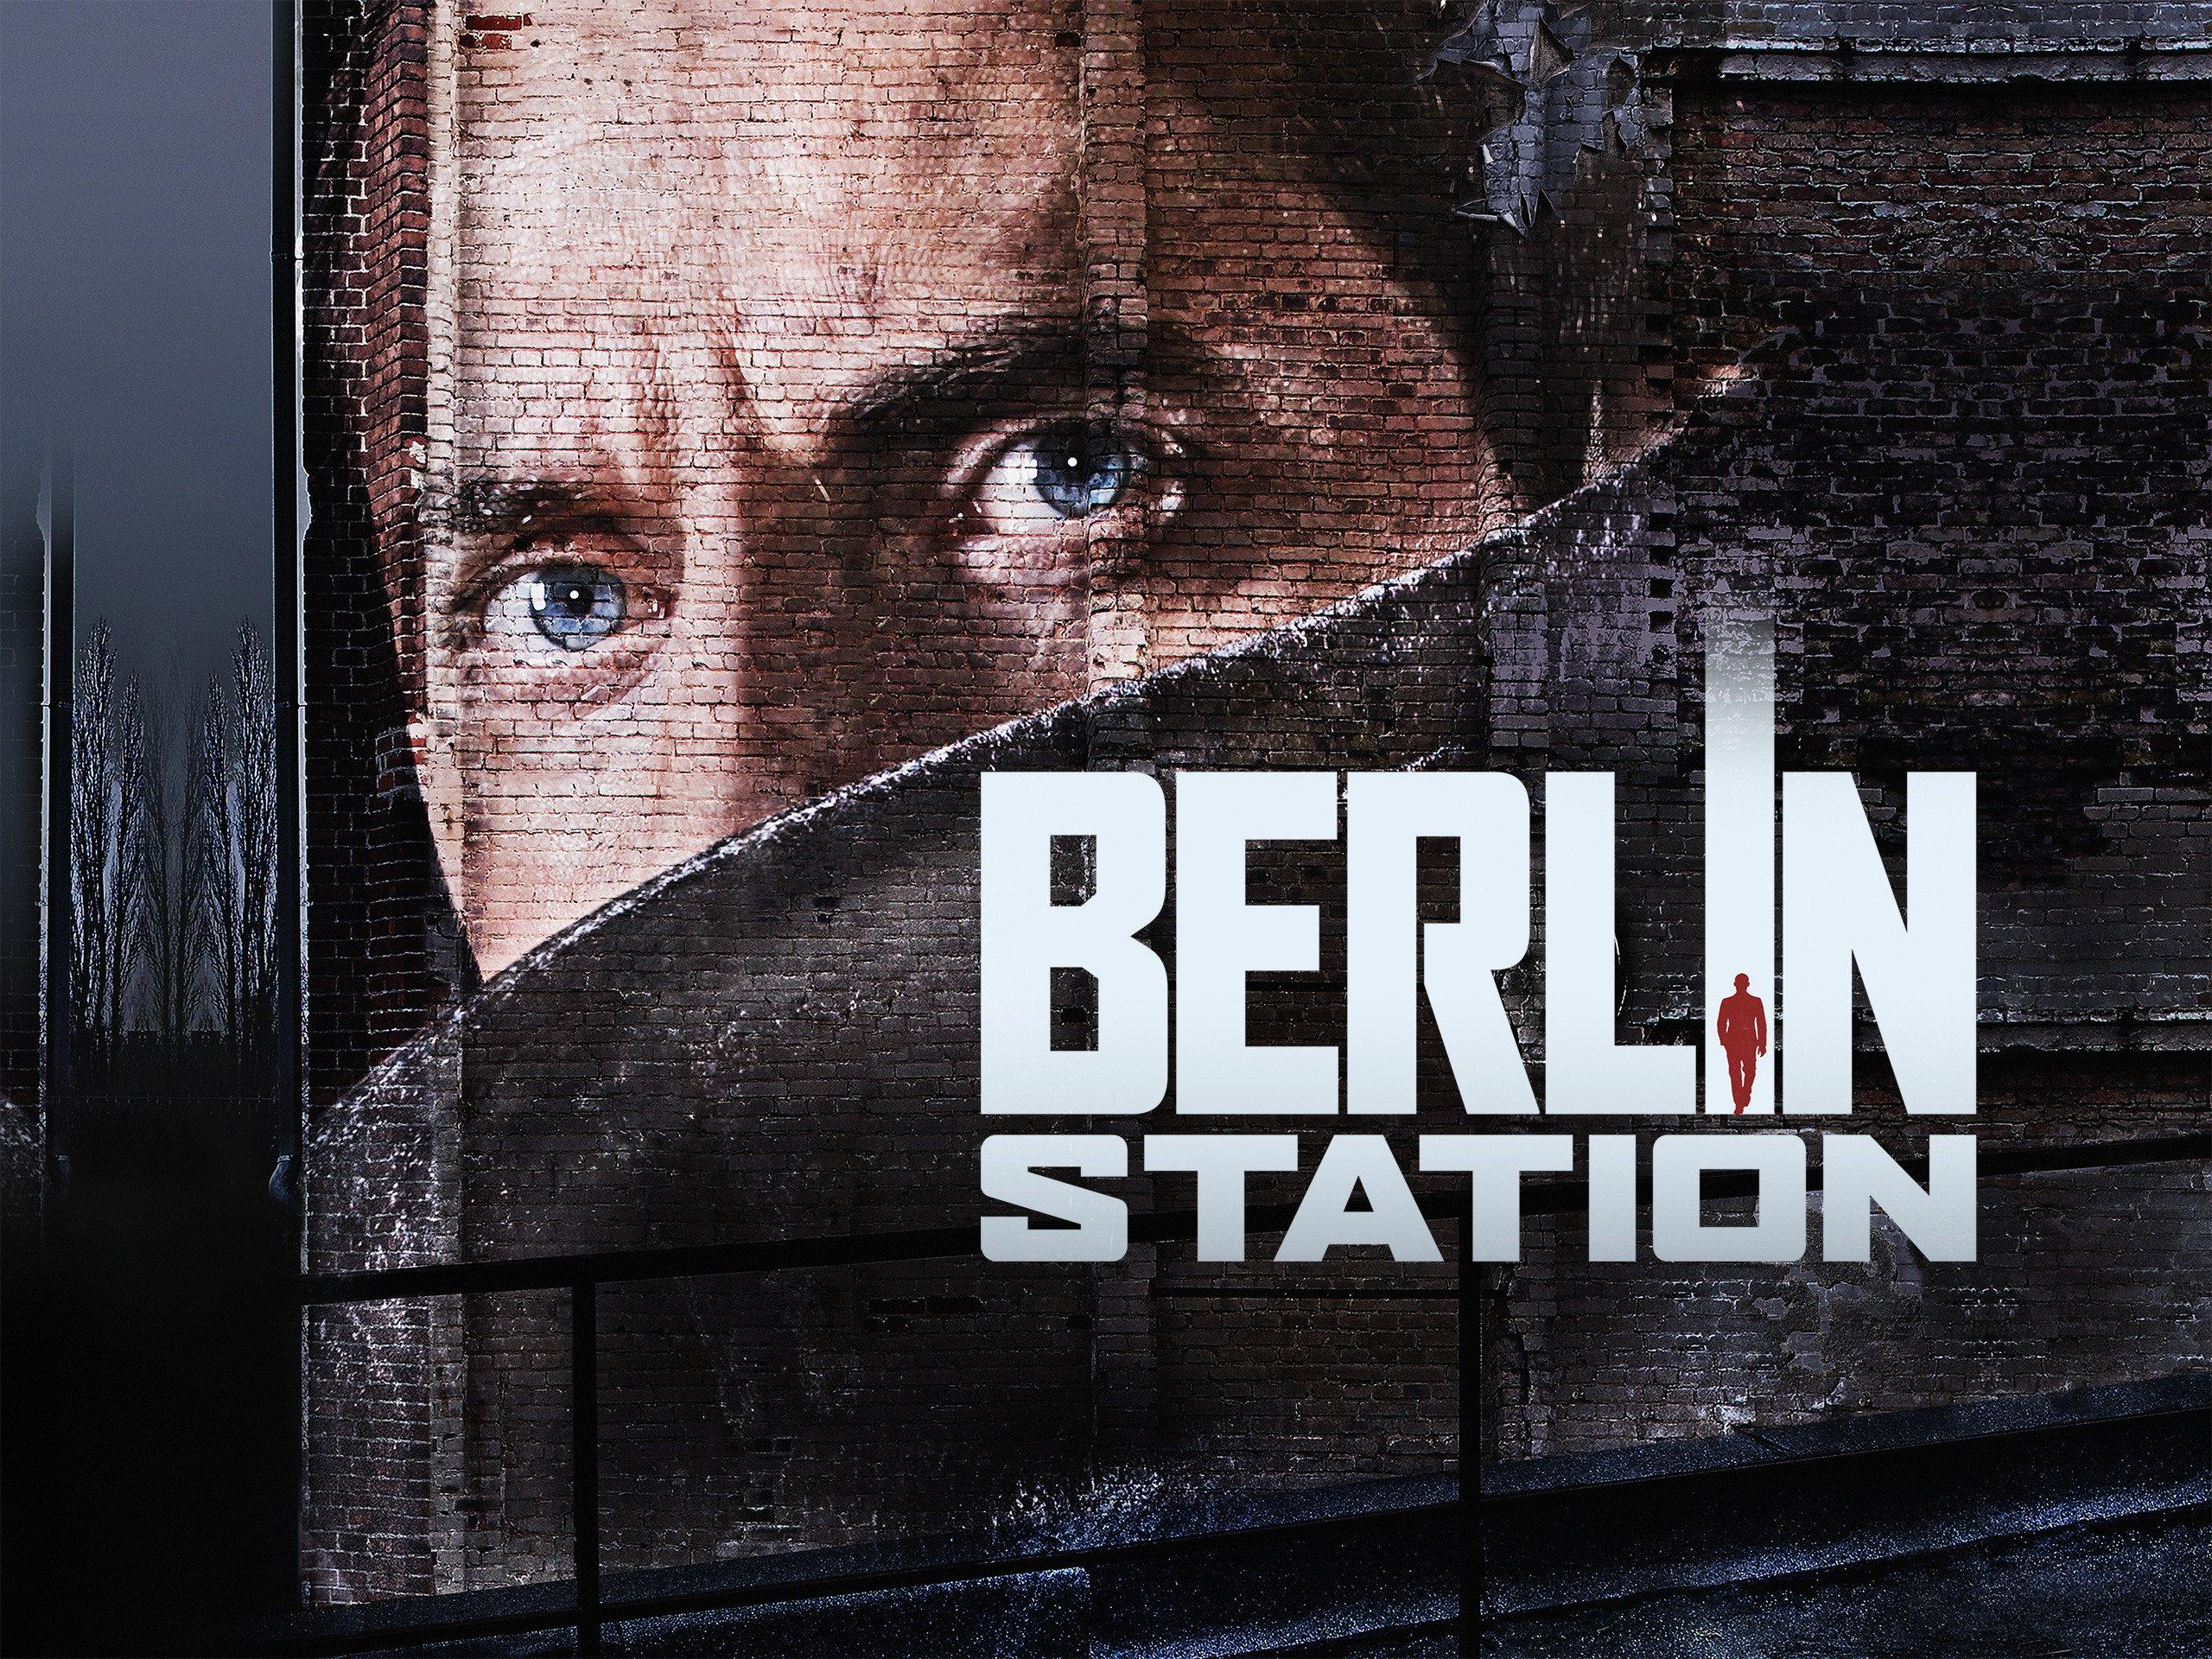 berlin station s01e08